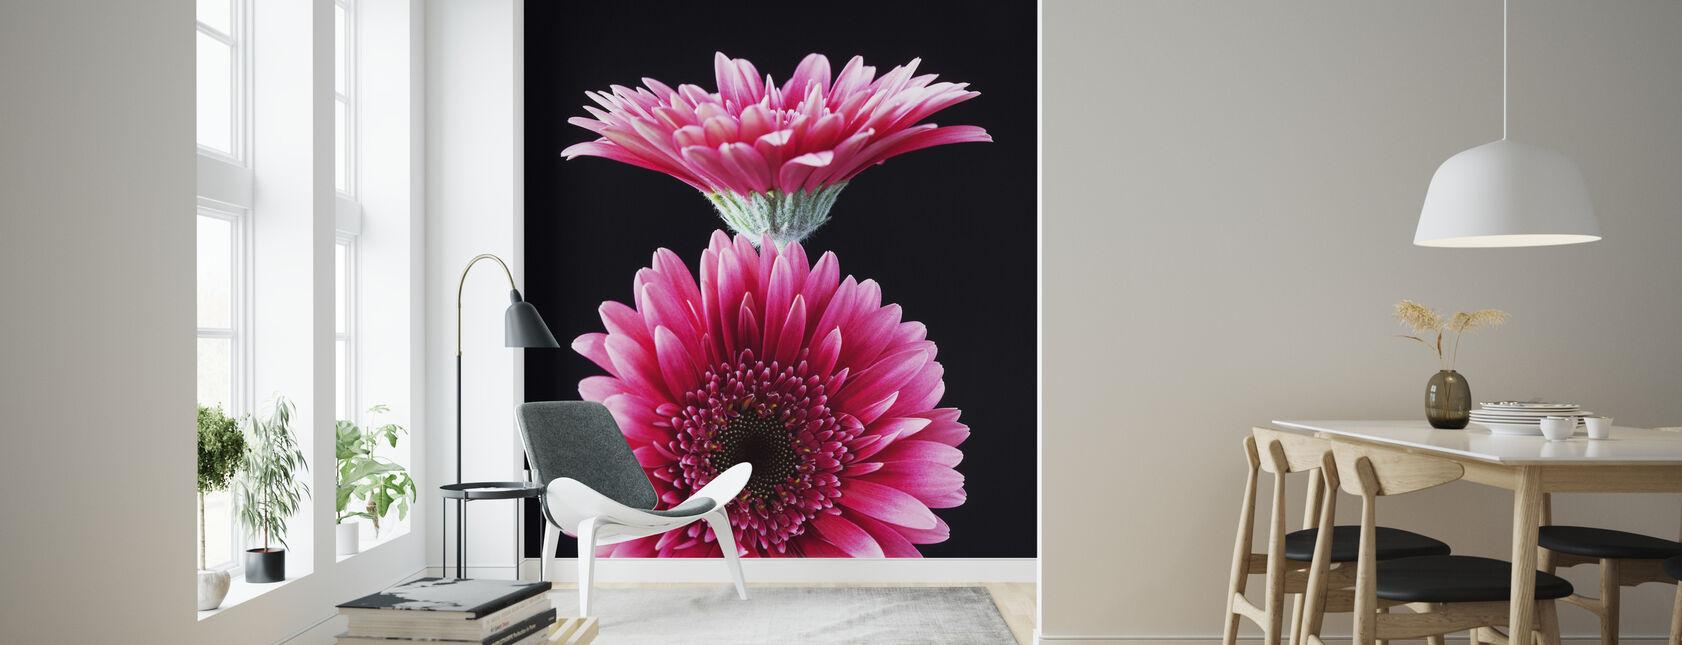 Gerbera - Wallpaper - Living Room